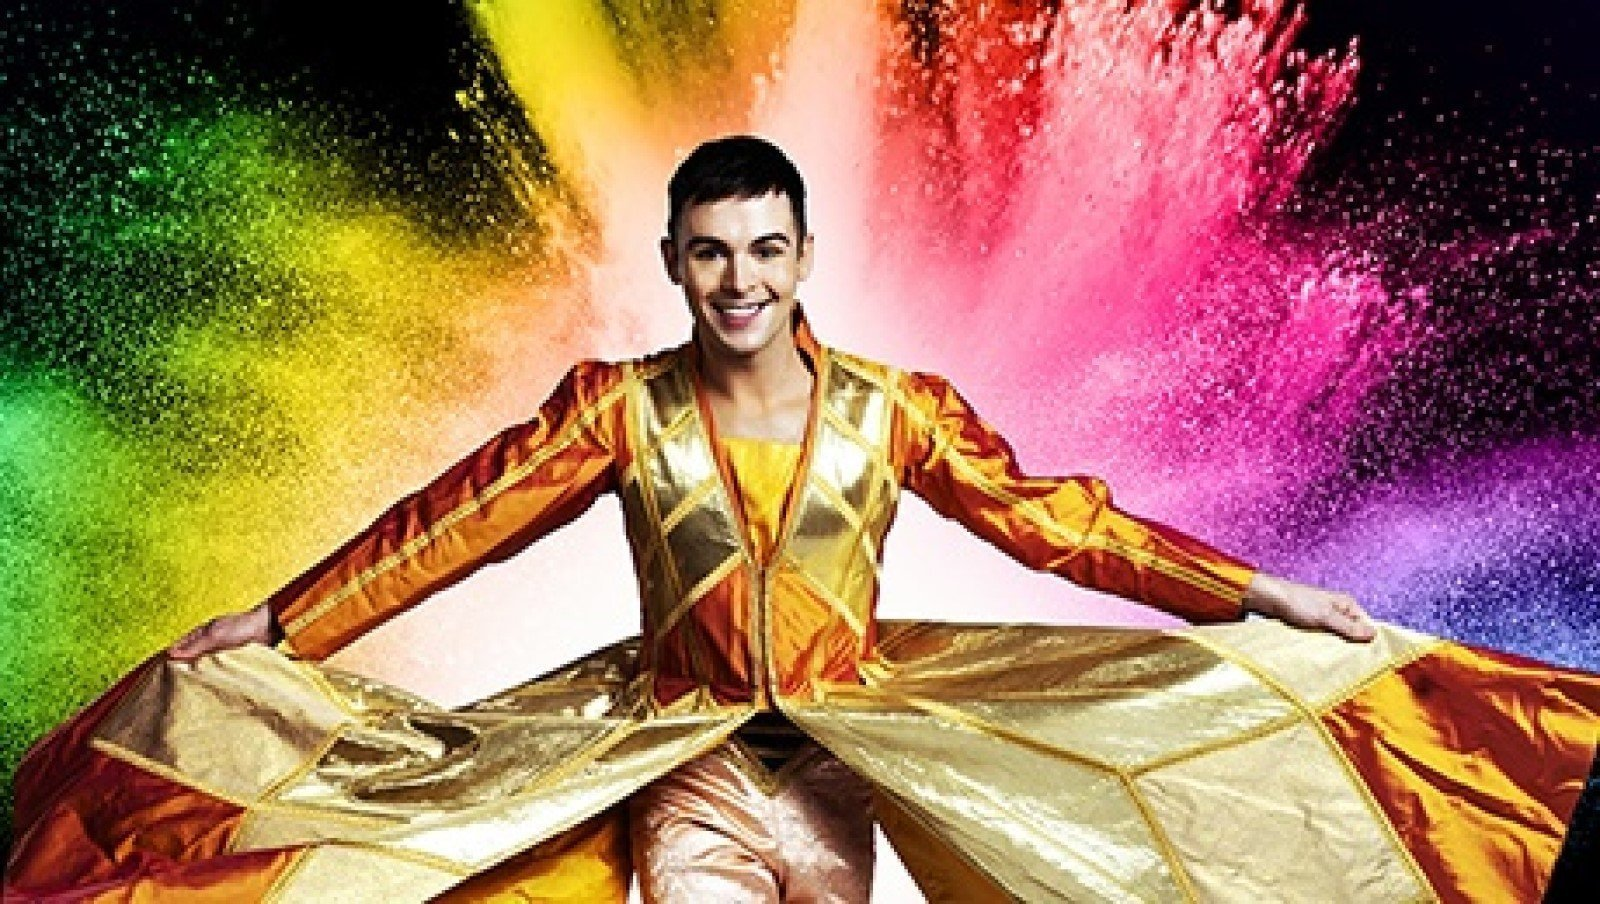 Joseph and the Amazing Technicolor Dreamcoat at New Theatre Oxford